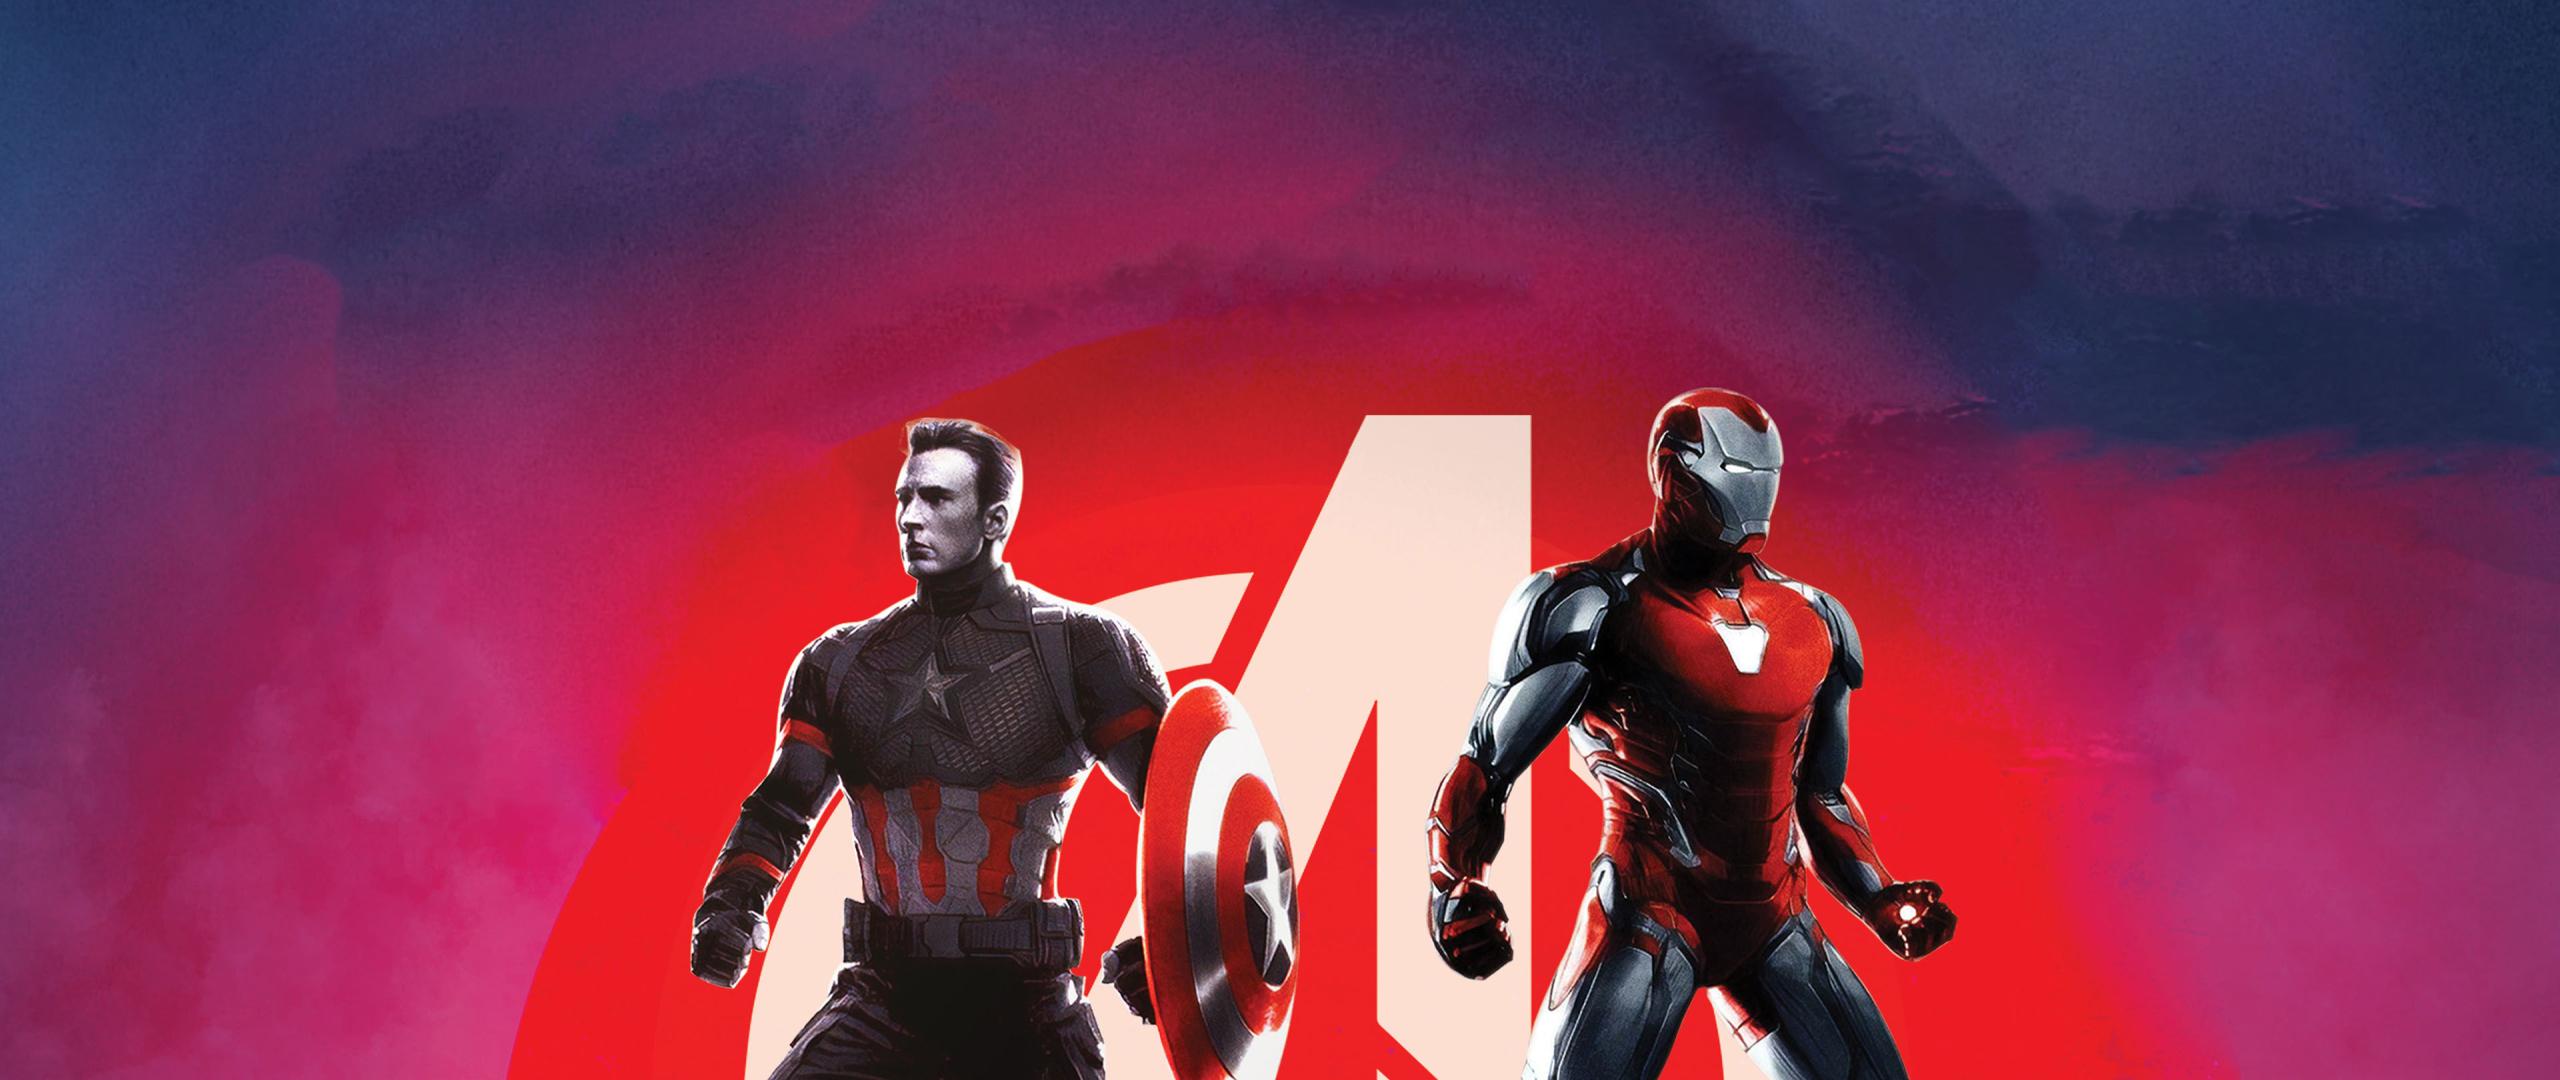 2560x1080 Captain America And Iron Man Avengers Endgame 2560x1080